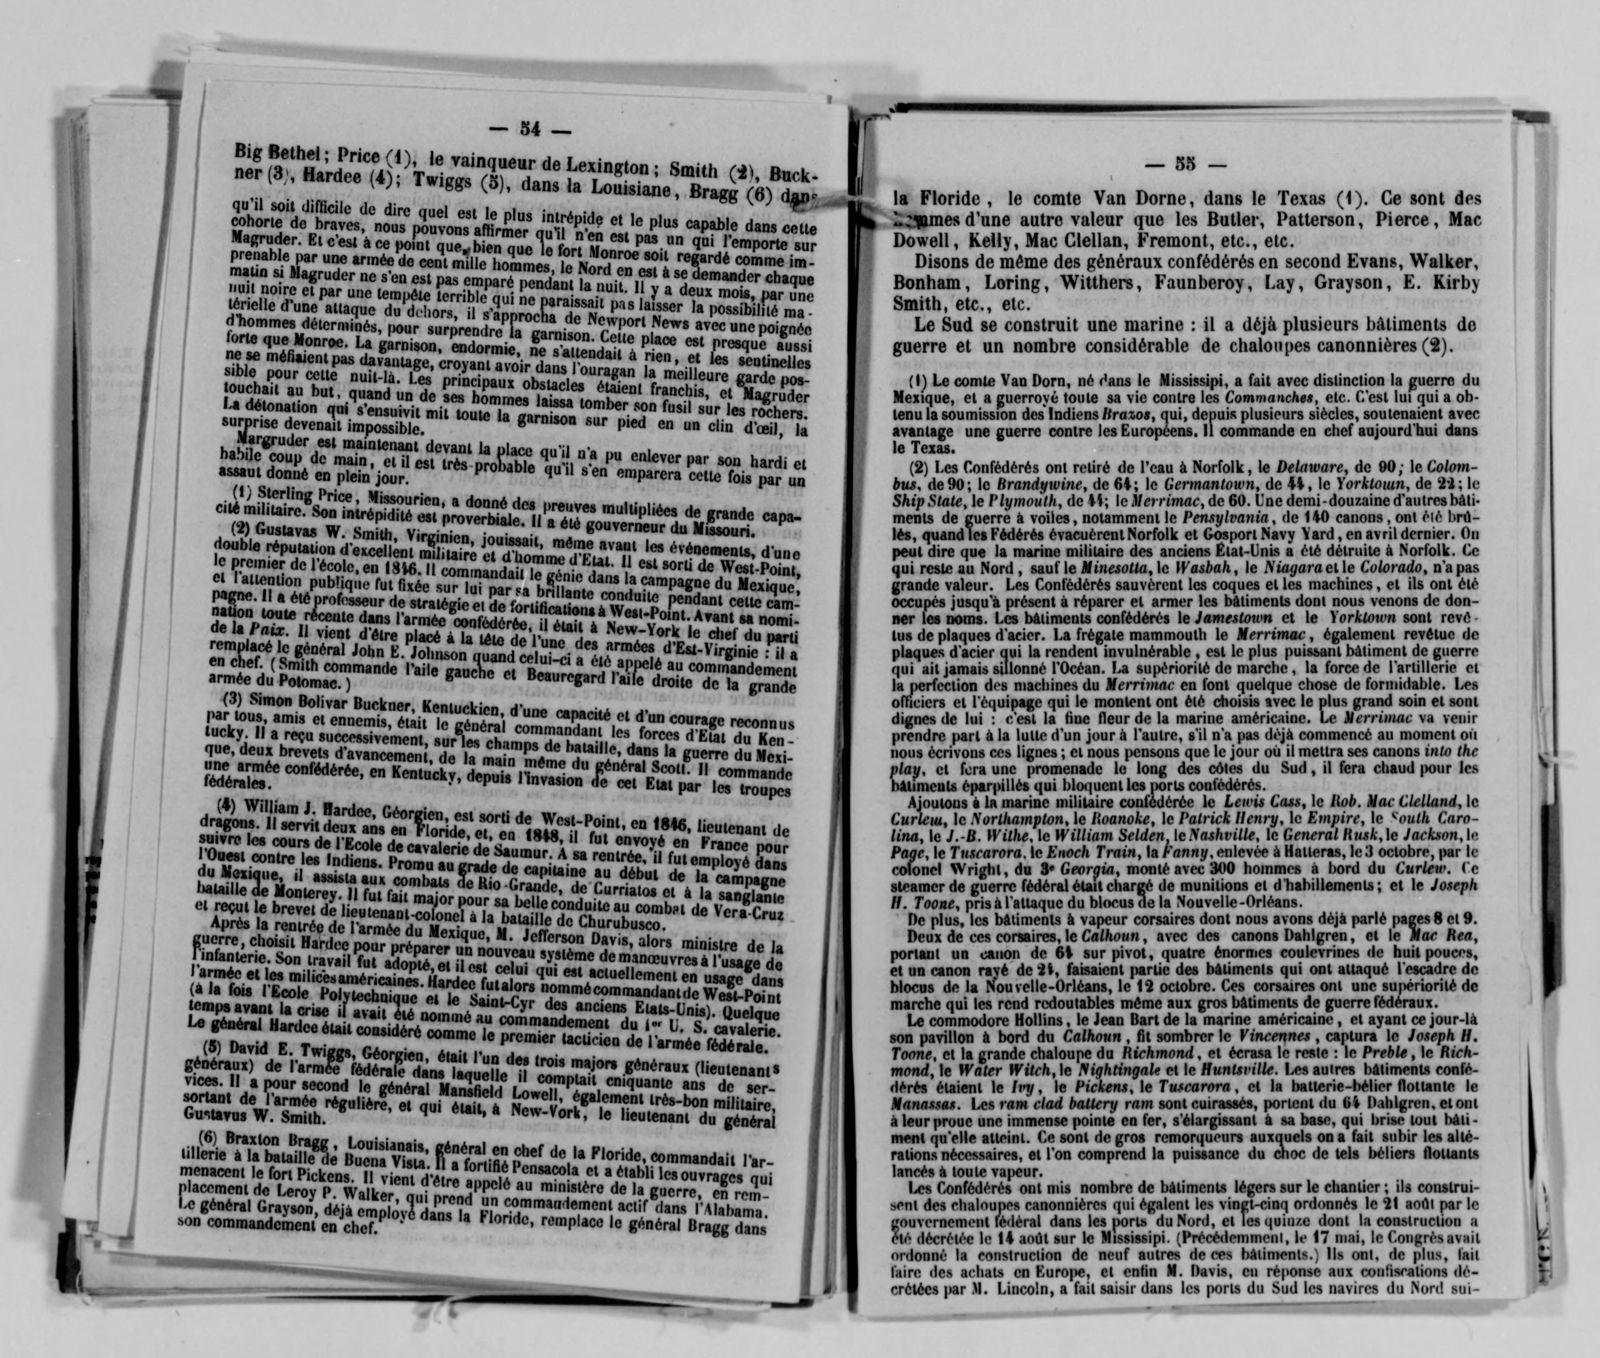 Confederate States of America records: Microfilm Reel 11